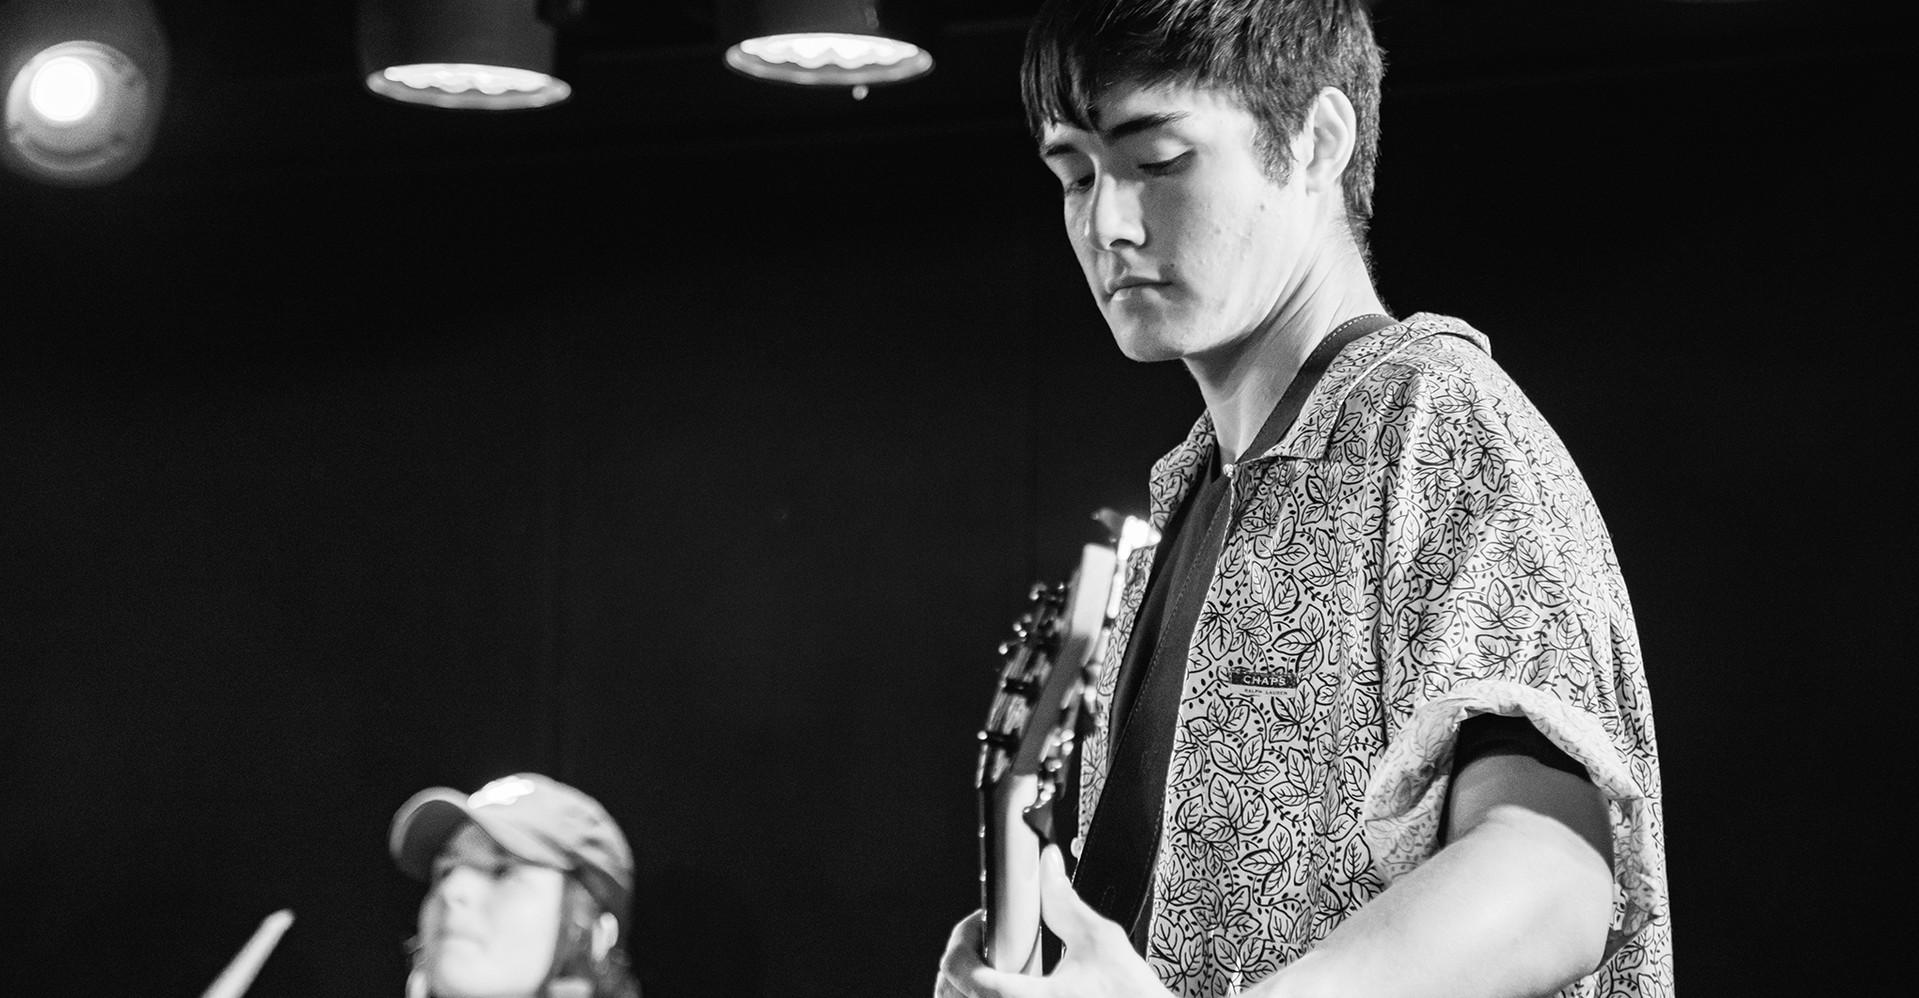 7-14-2019 - daniel victor & band - mercu